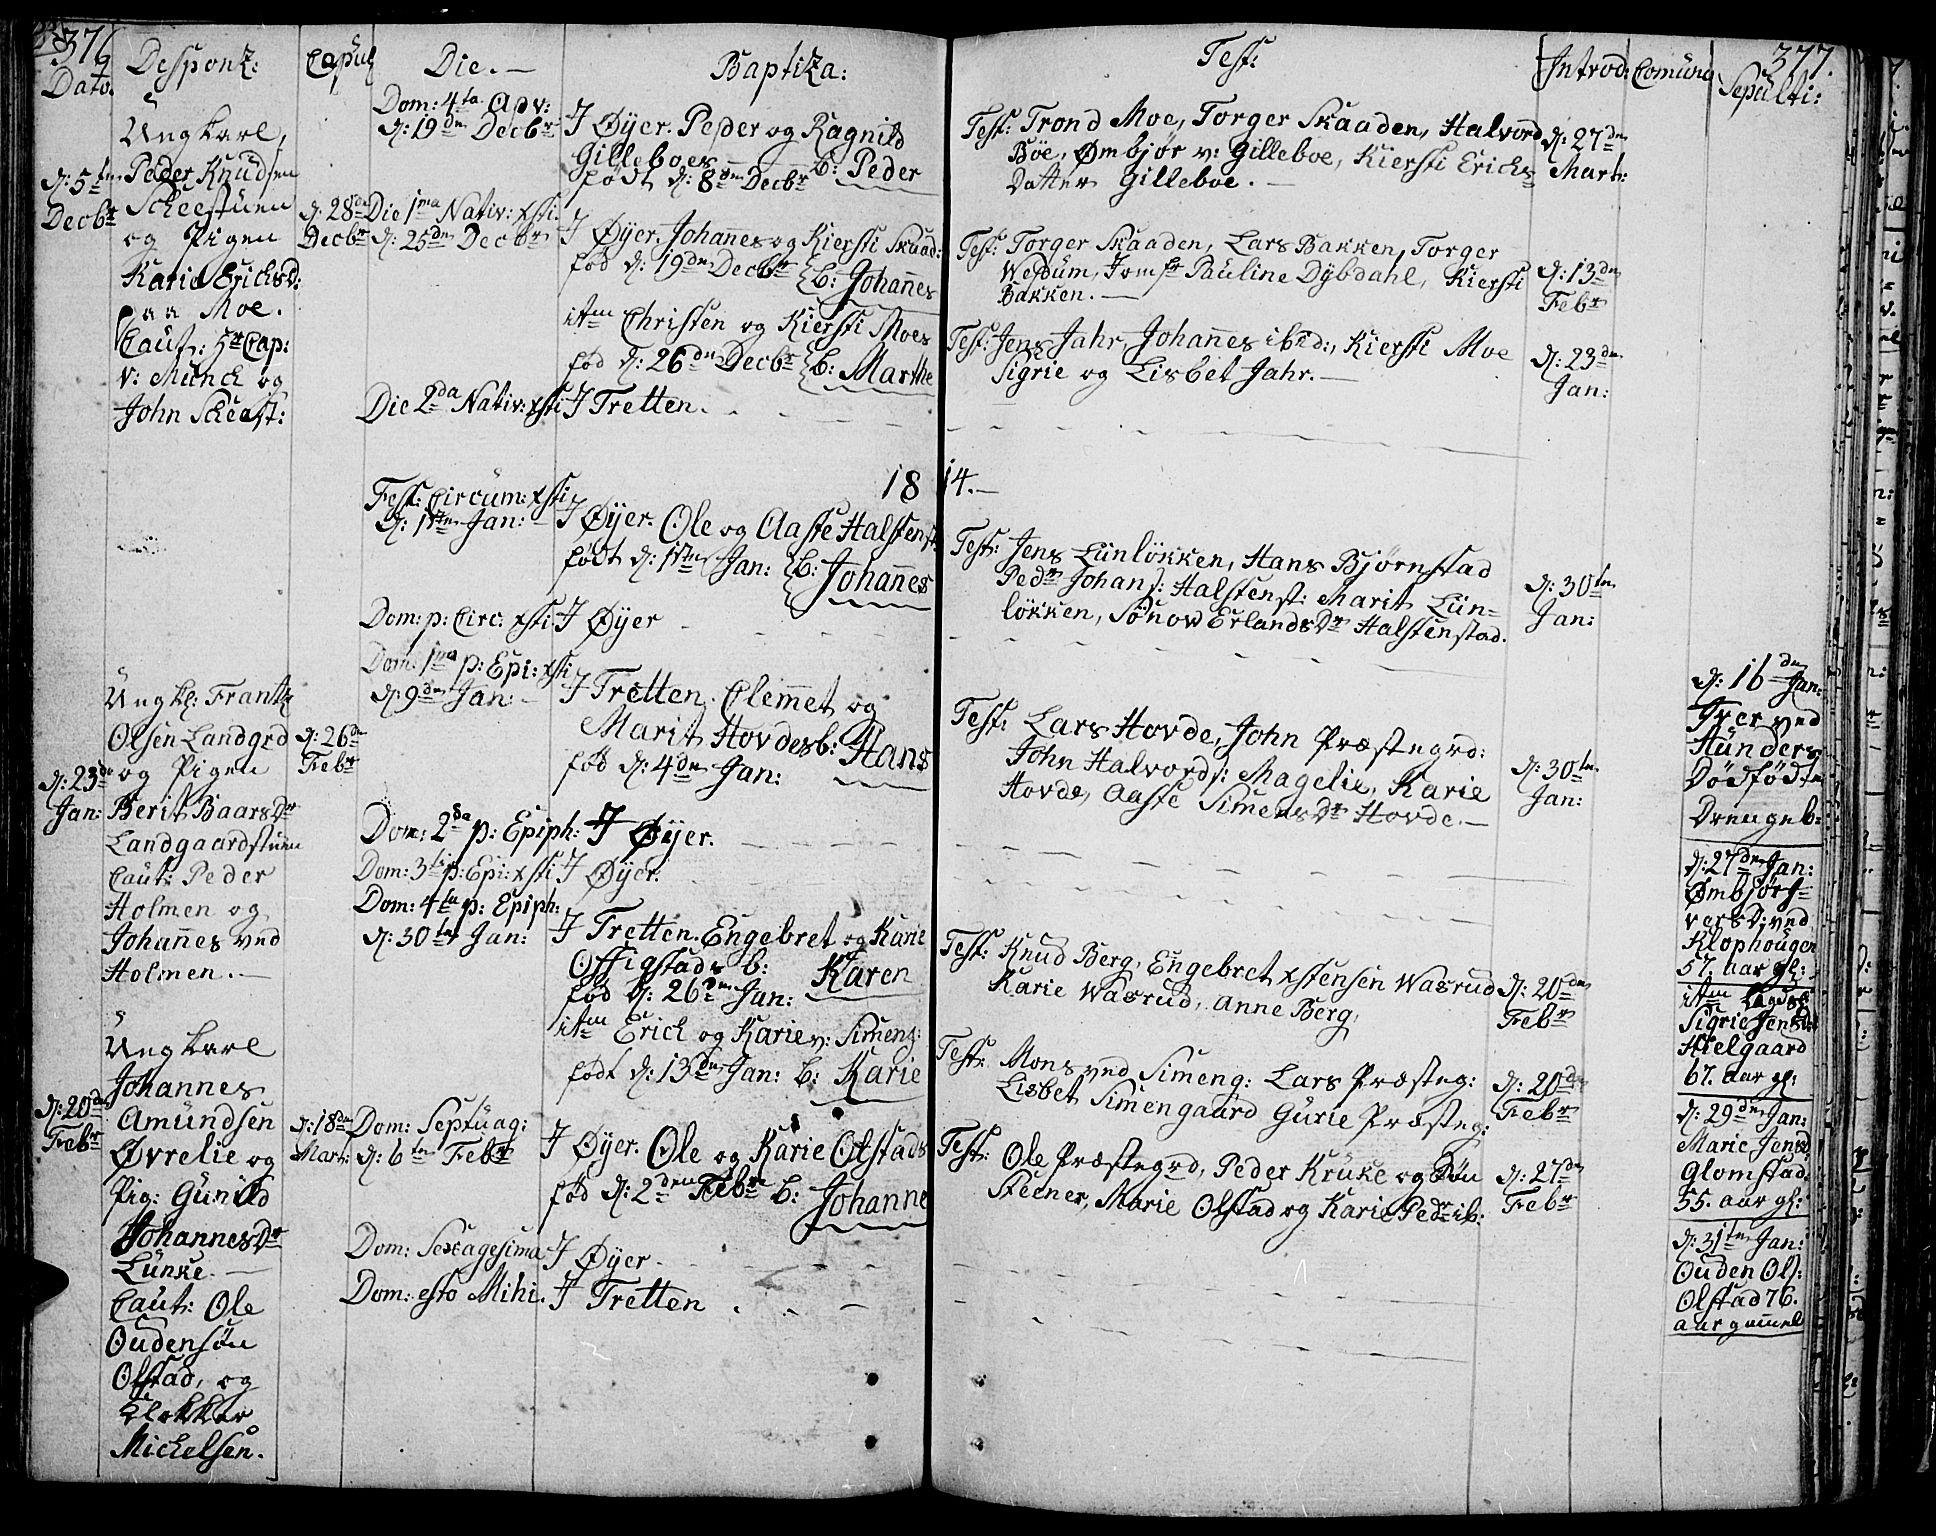 SAH, Øyer prestekontor, Ministerialbok nr. 3, 1784-1824, s. 376-377